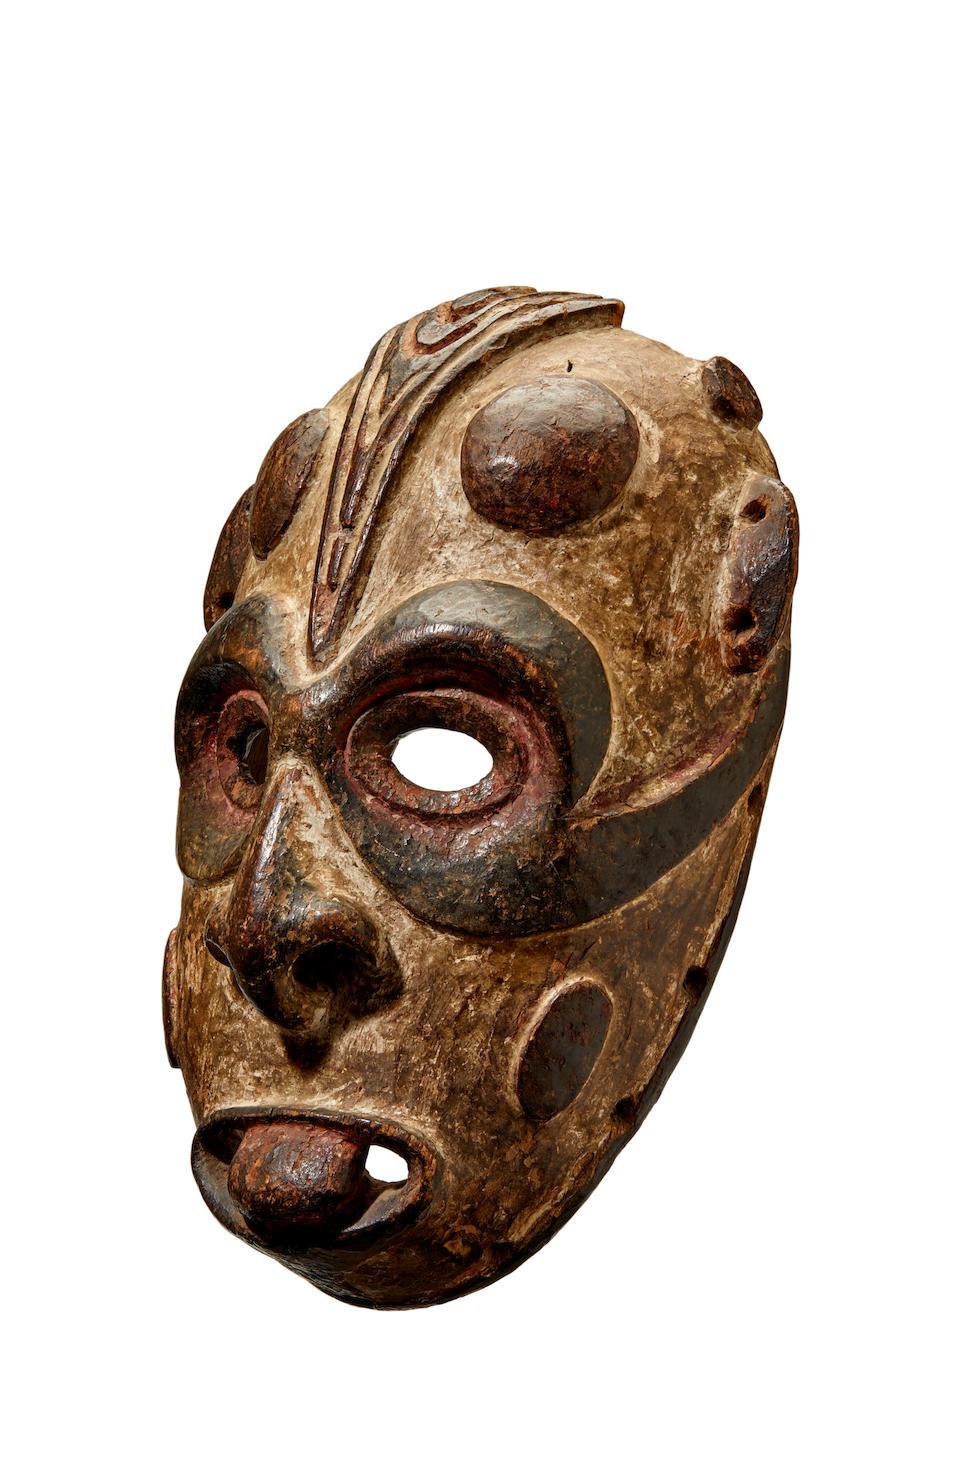 Biwat Mask, Yuat River Region, Lower Sepik, Papua New Guinea